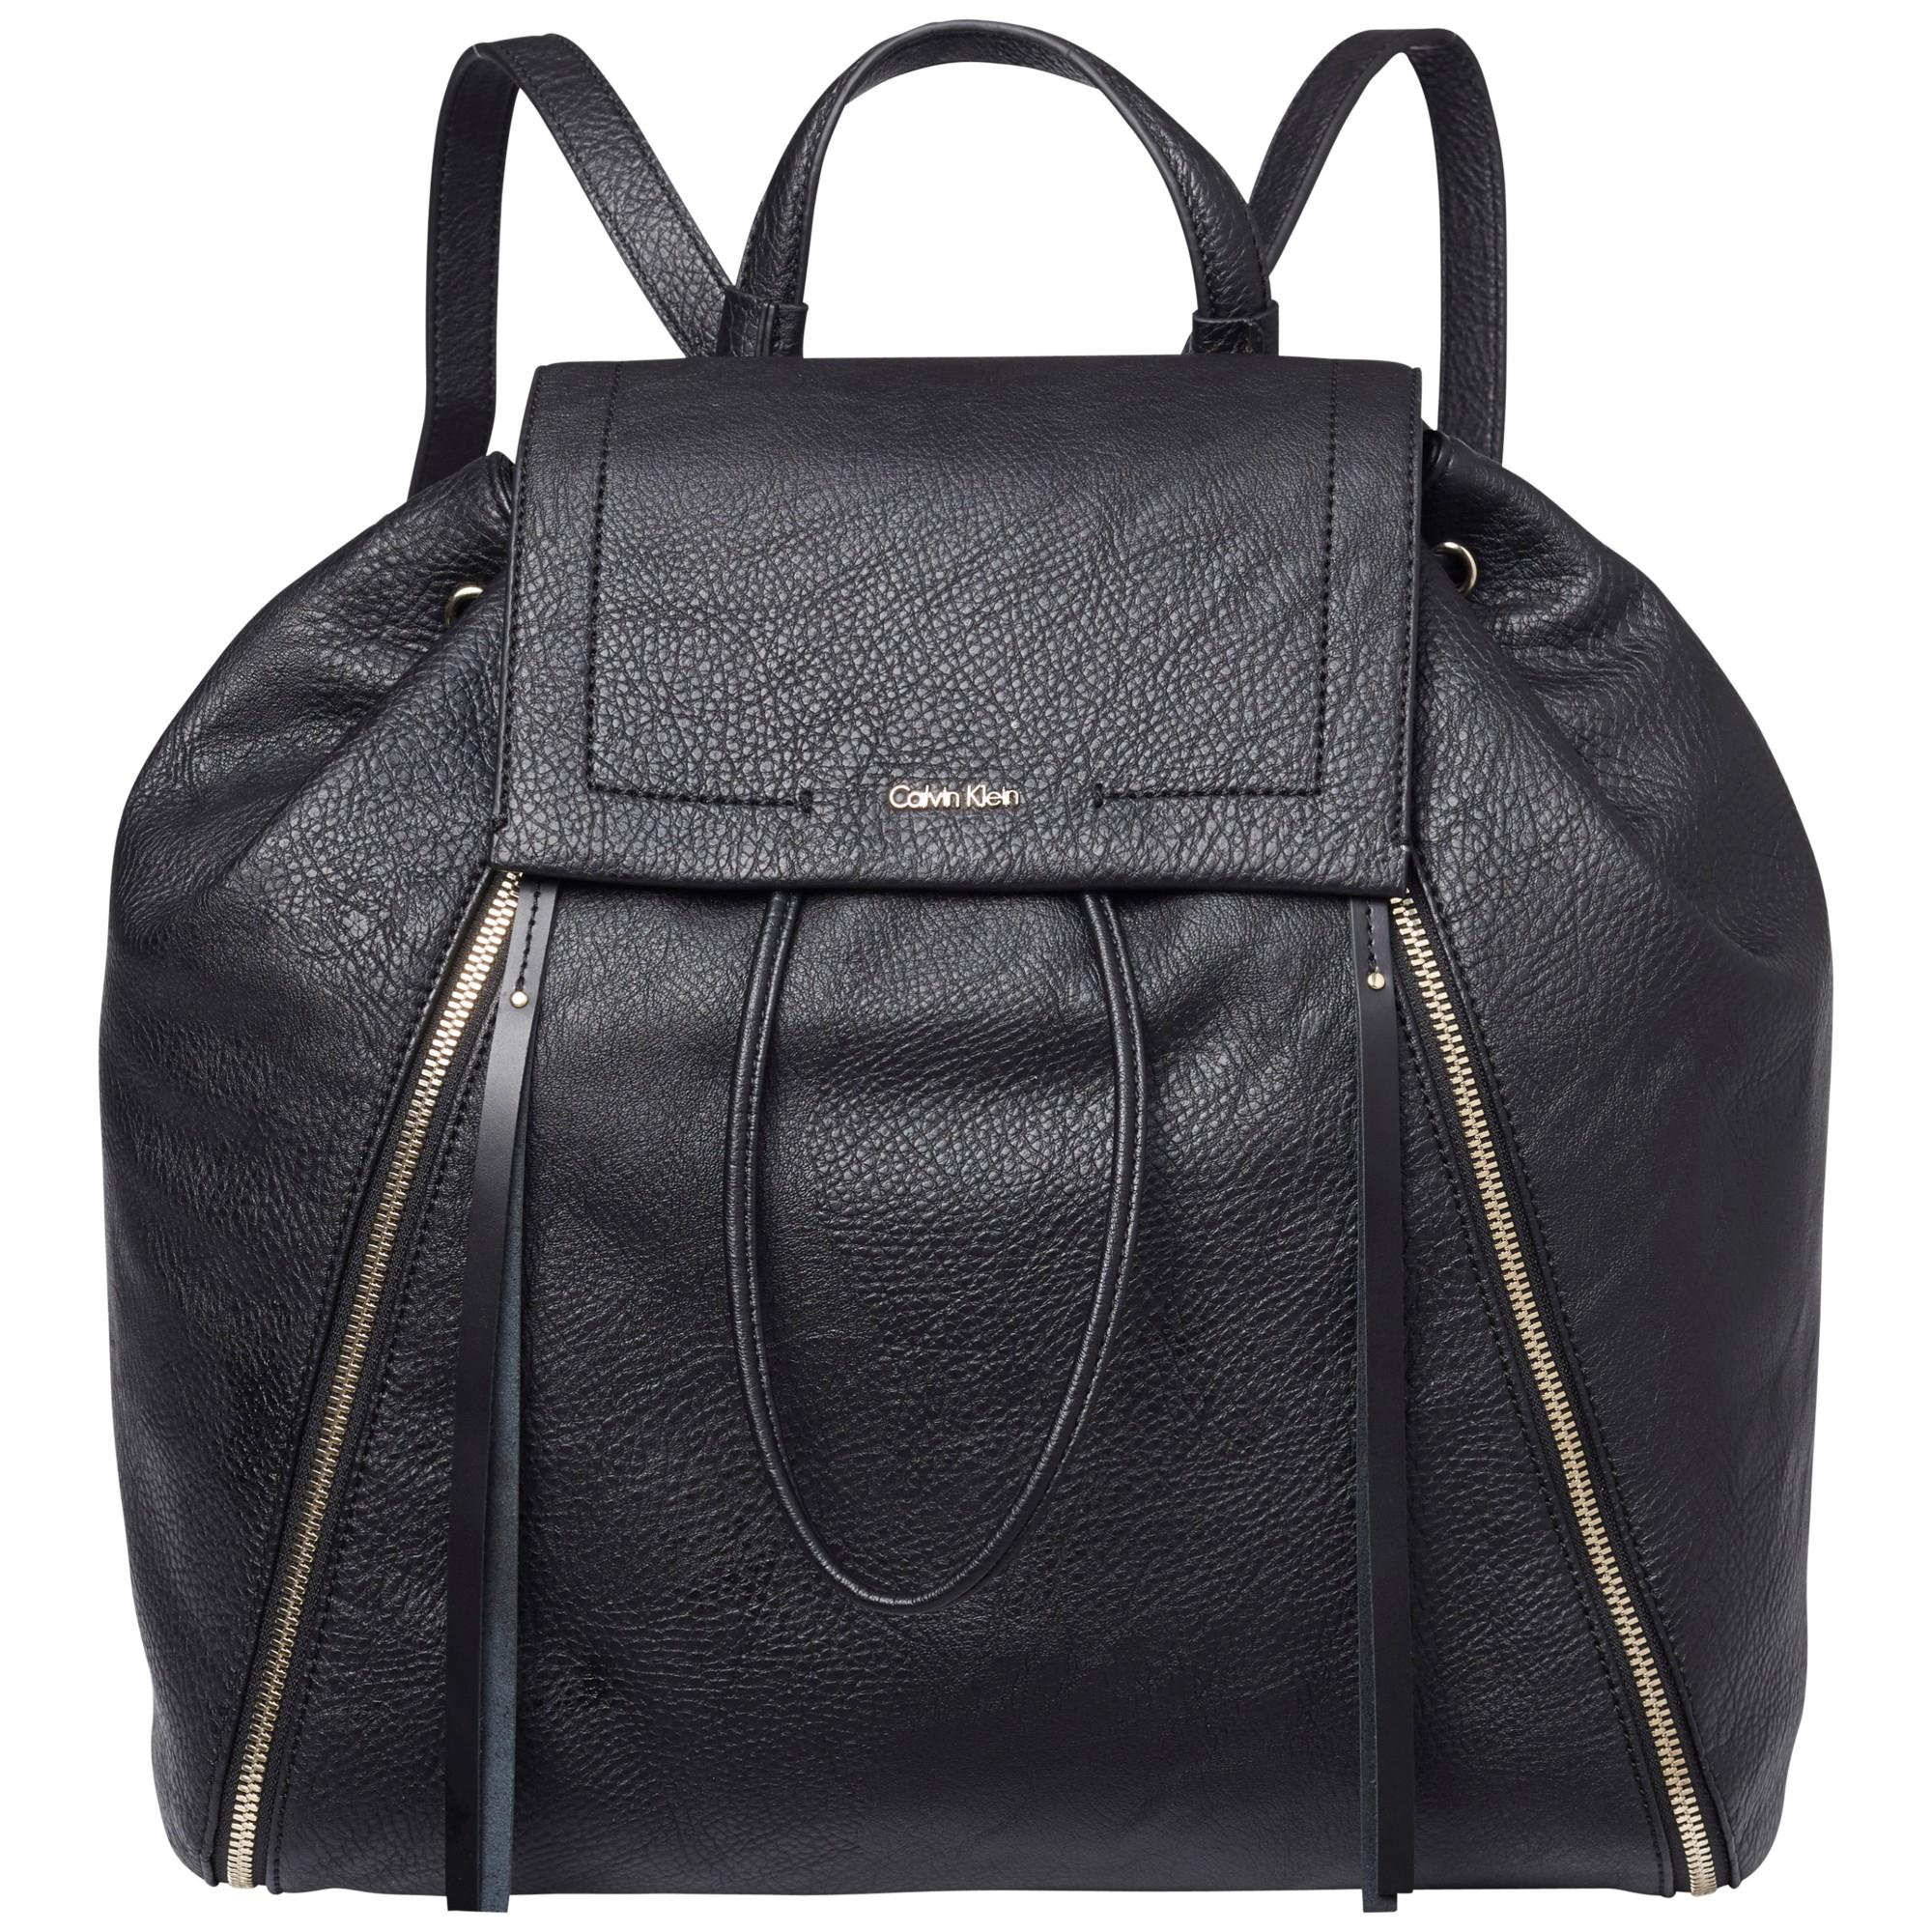 Calvin Klein Izzy Backpack Black 40630510   H40.64 x W39.37 x D17.78cm